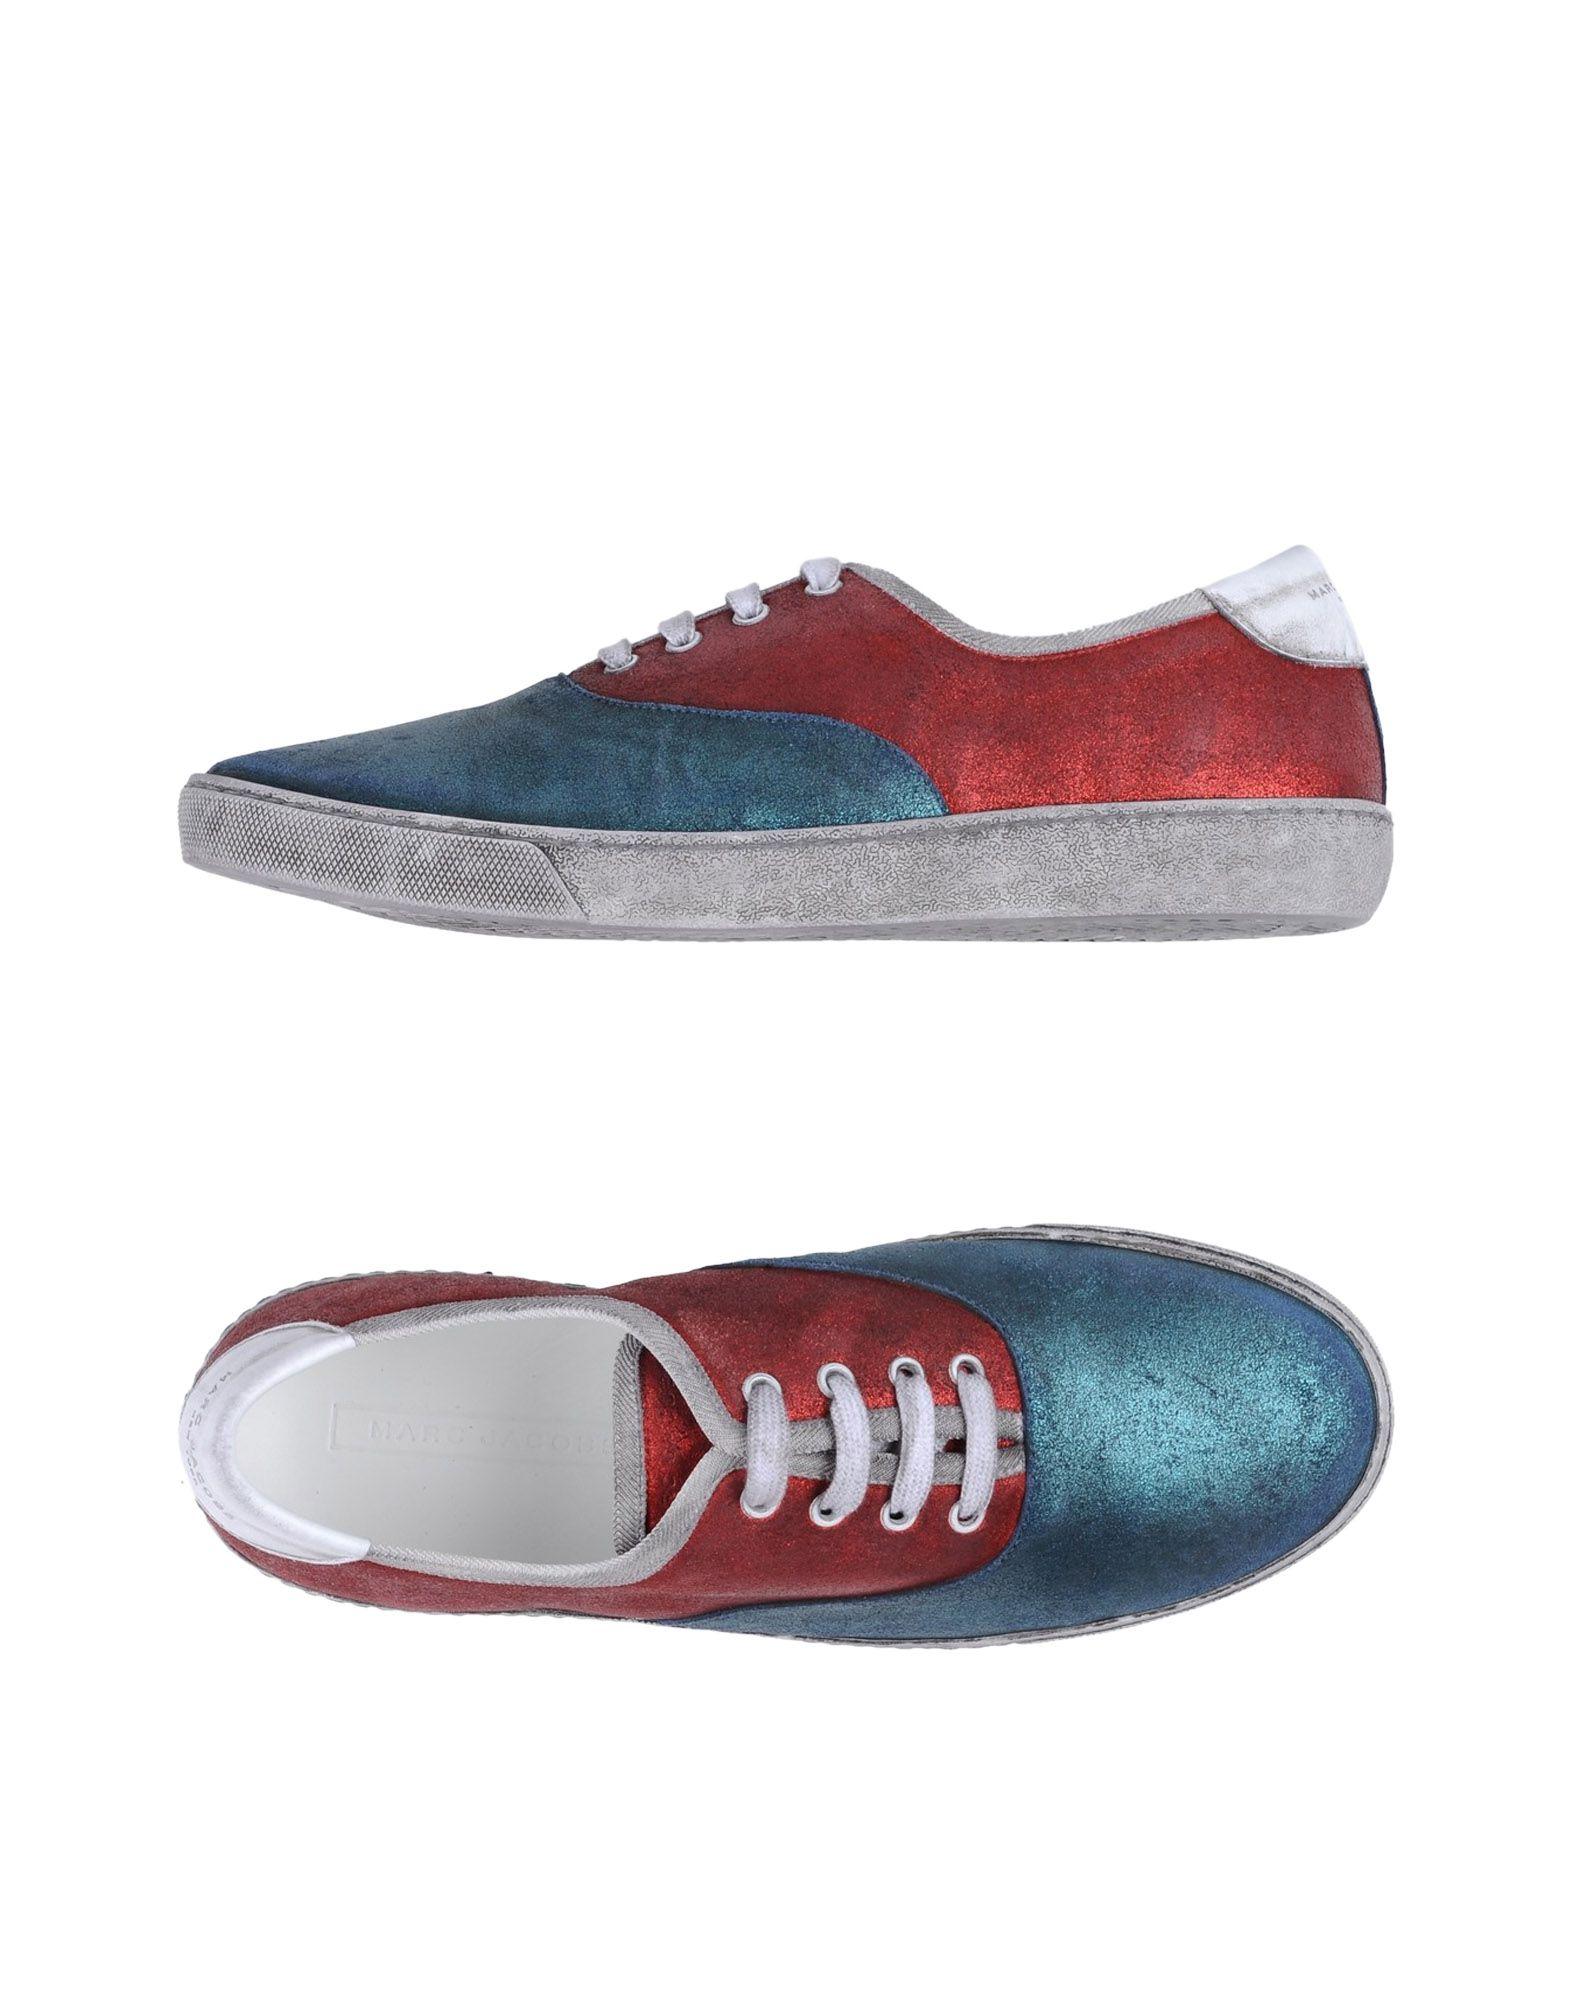 Sneakers Marc Jacobs Uomo - Acquista online su